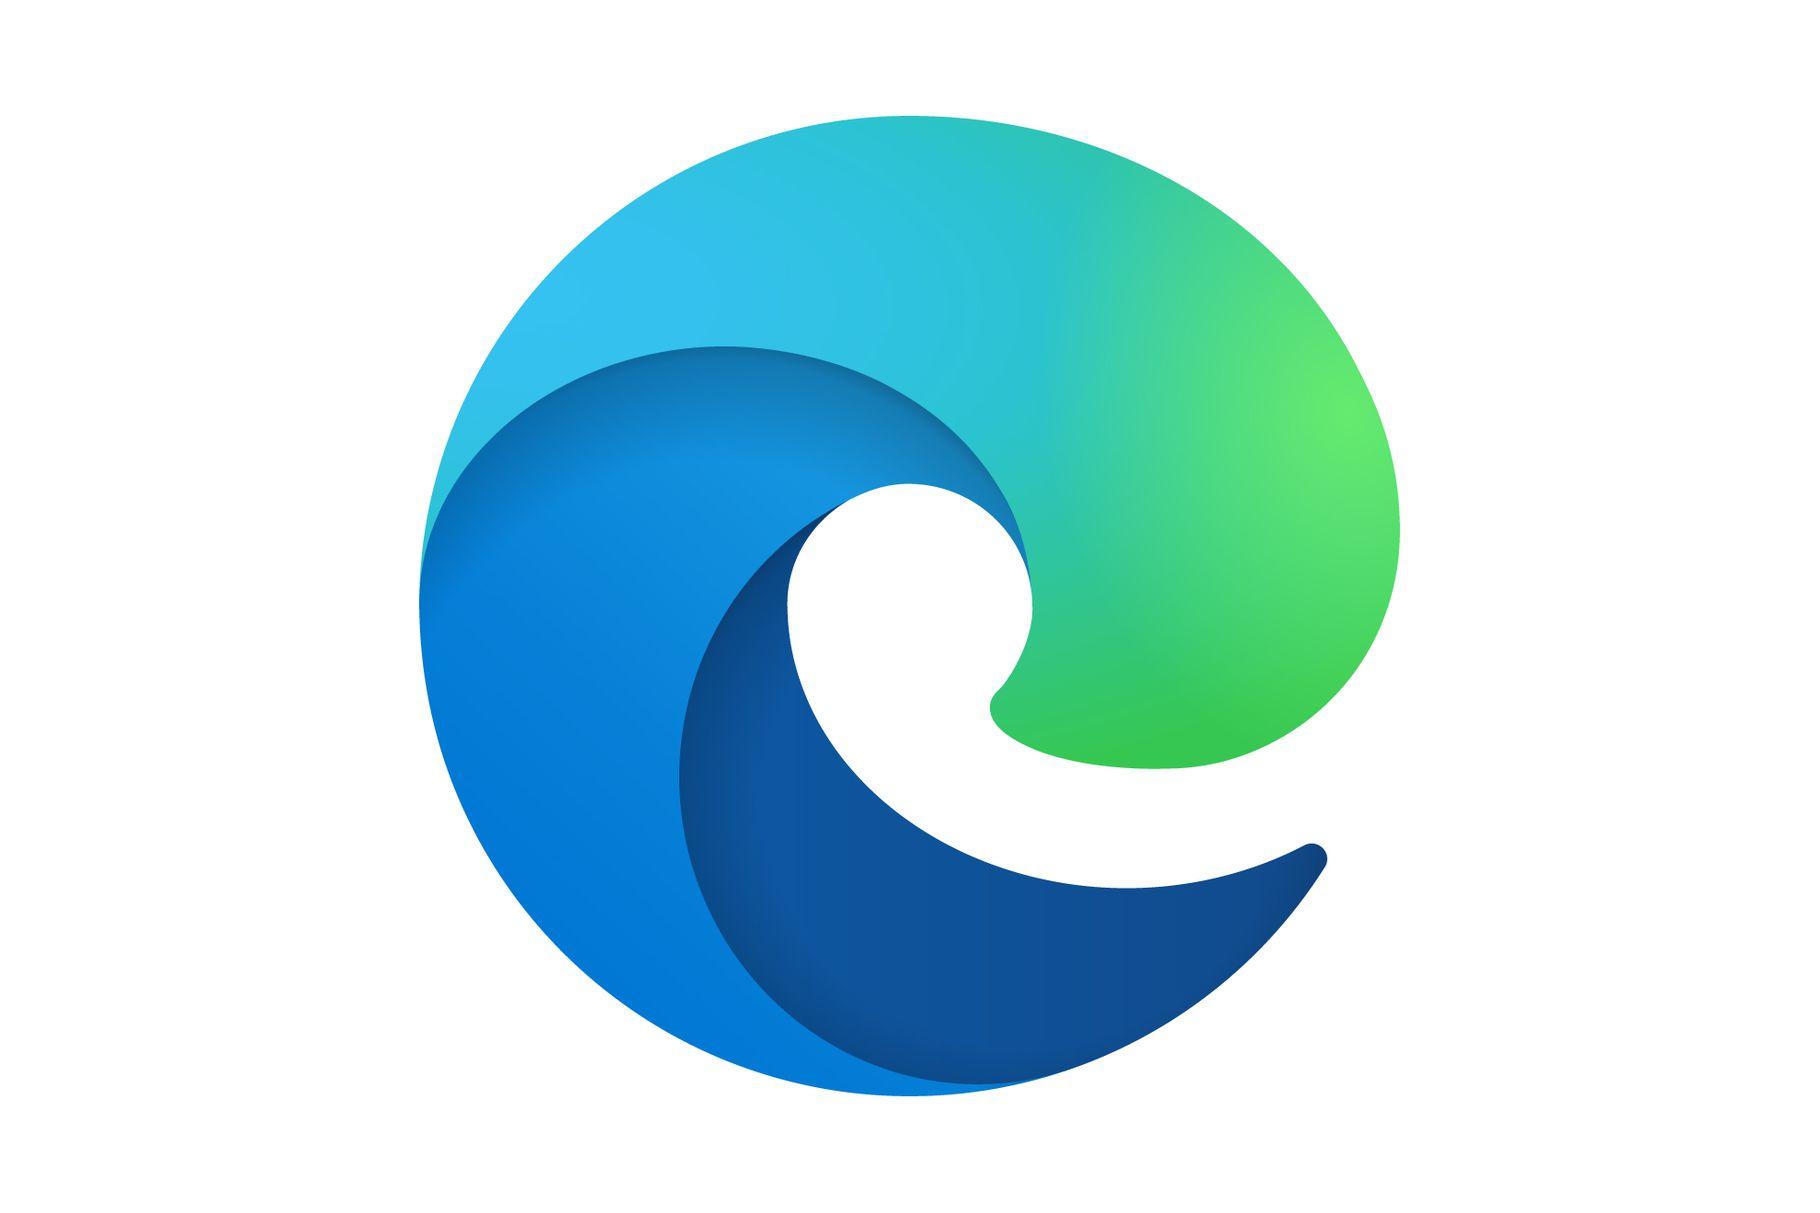 microsoft edge nowe logo 2